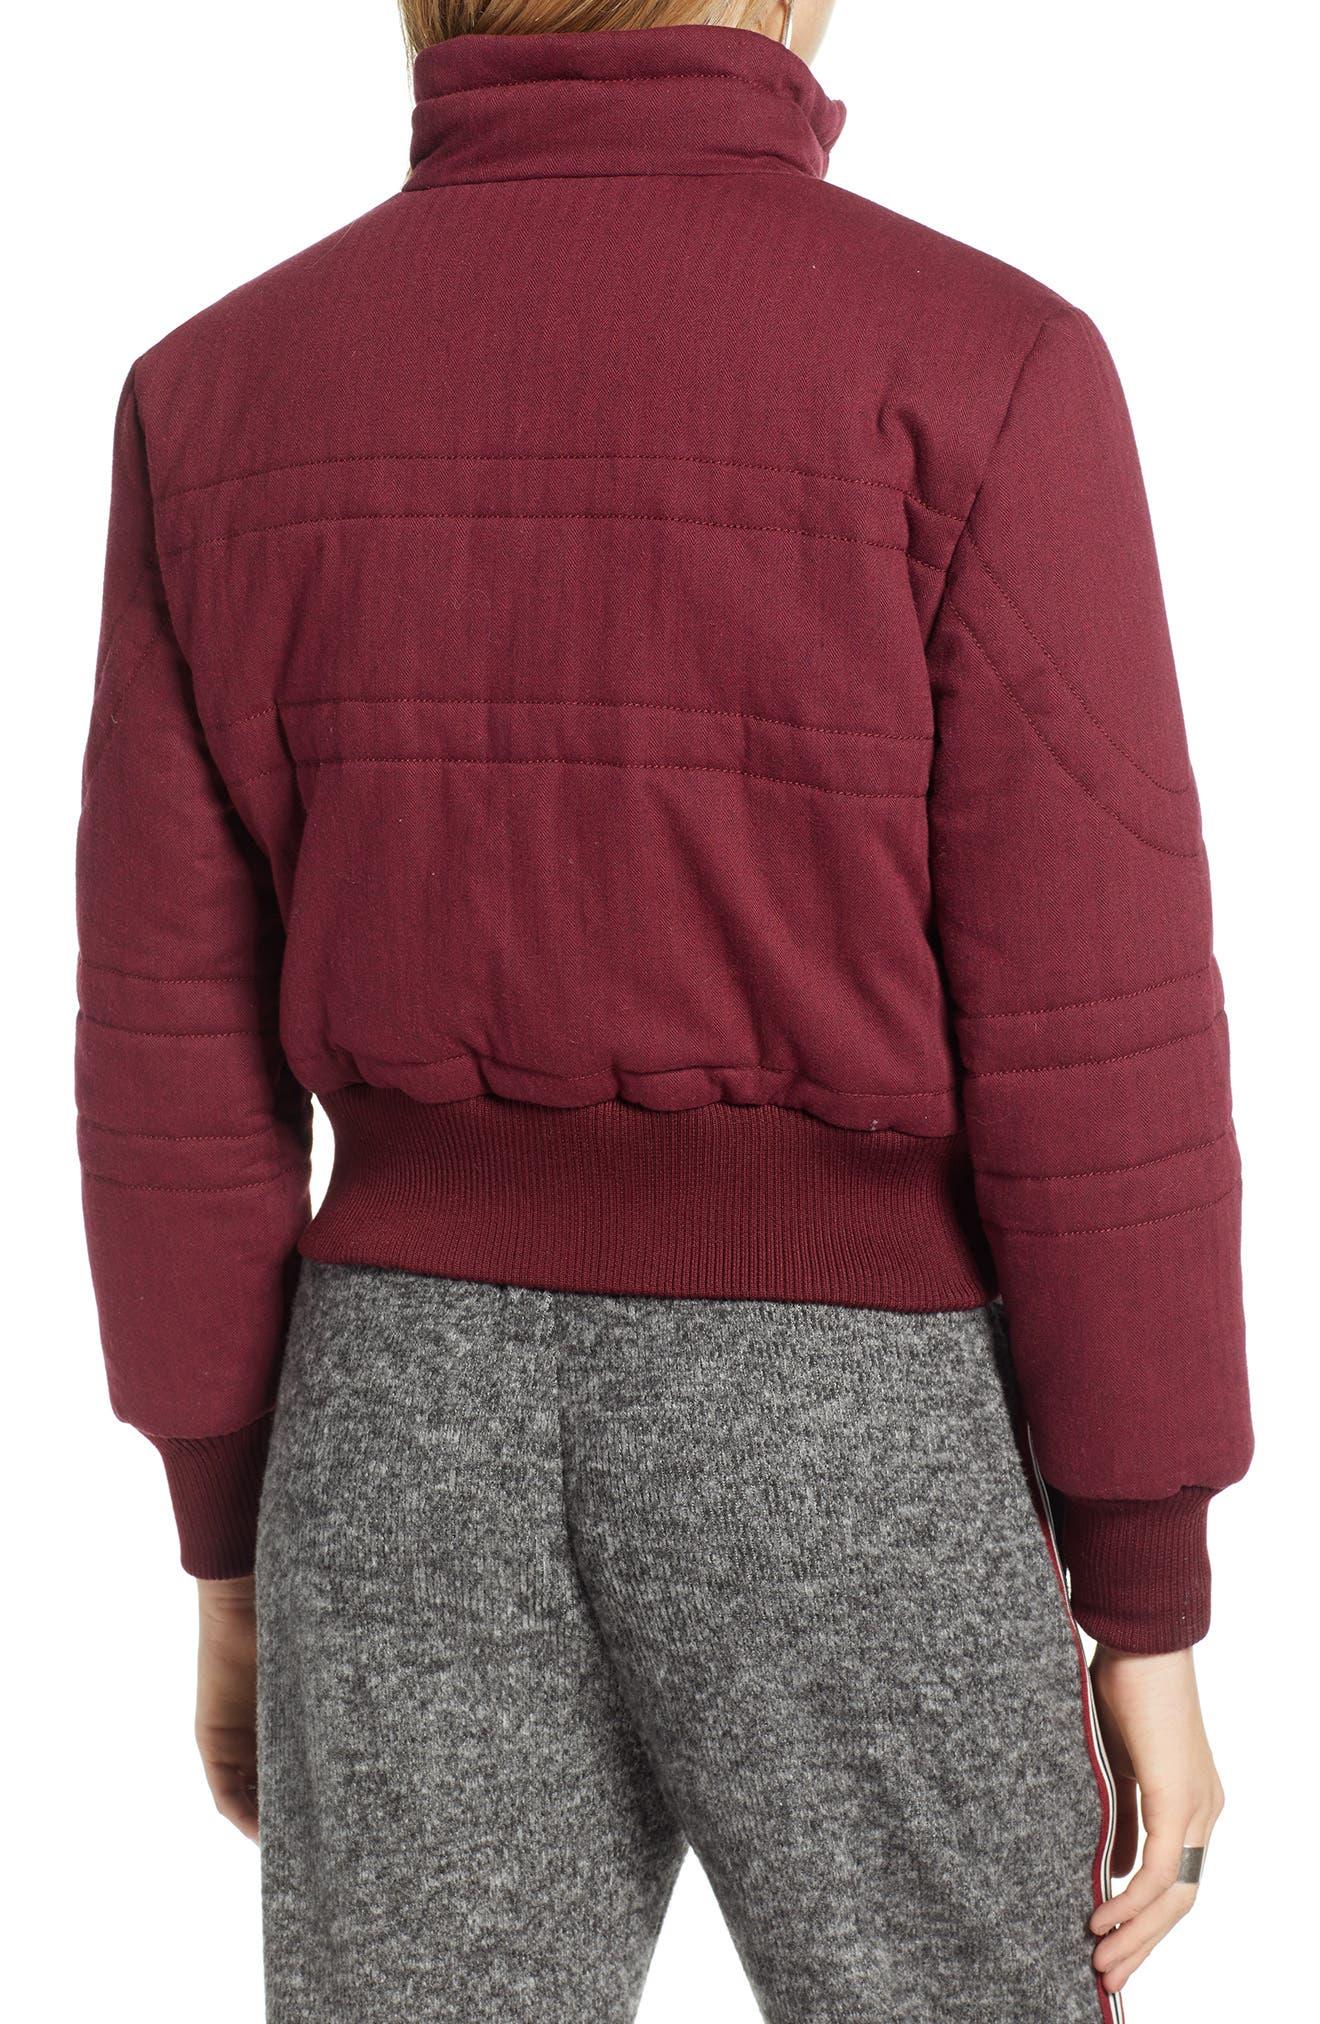 TREASURE & BOND, Flannel Crop Puffer Jacket, Alternate thumbnail 2, color, RED TANNIN HEATHER